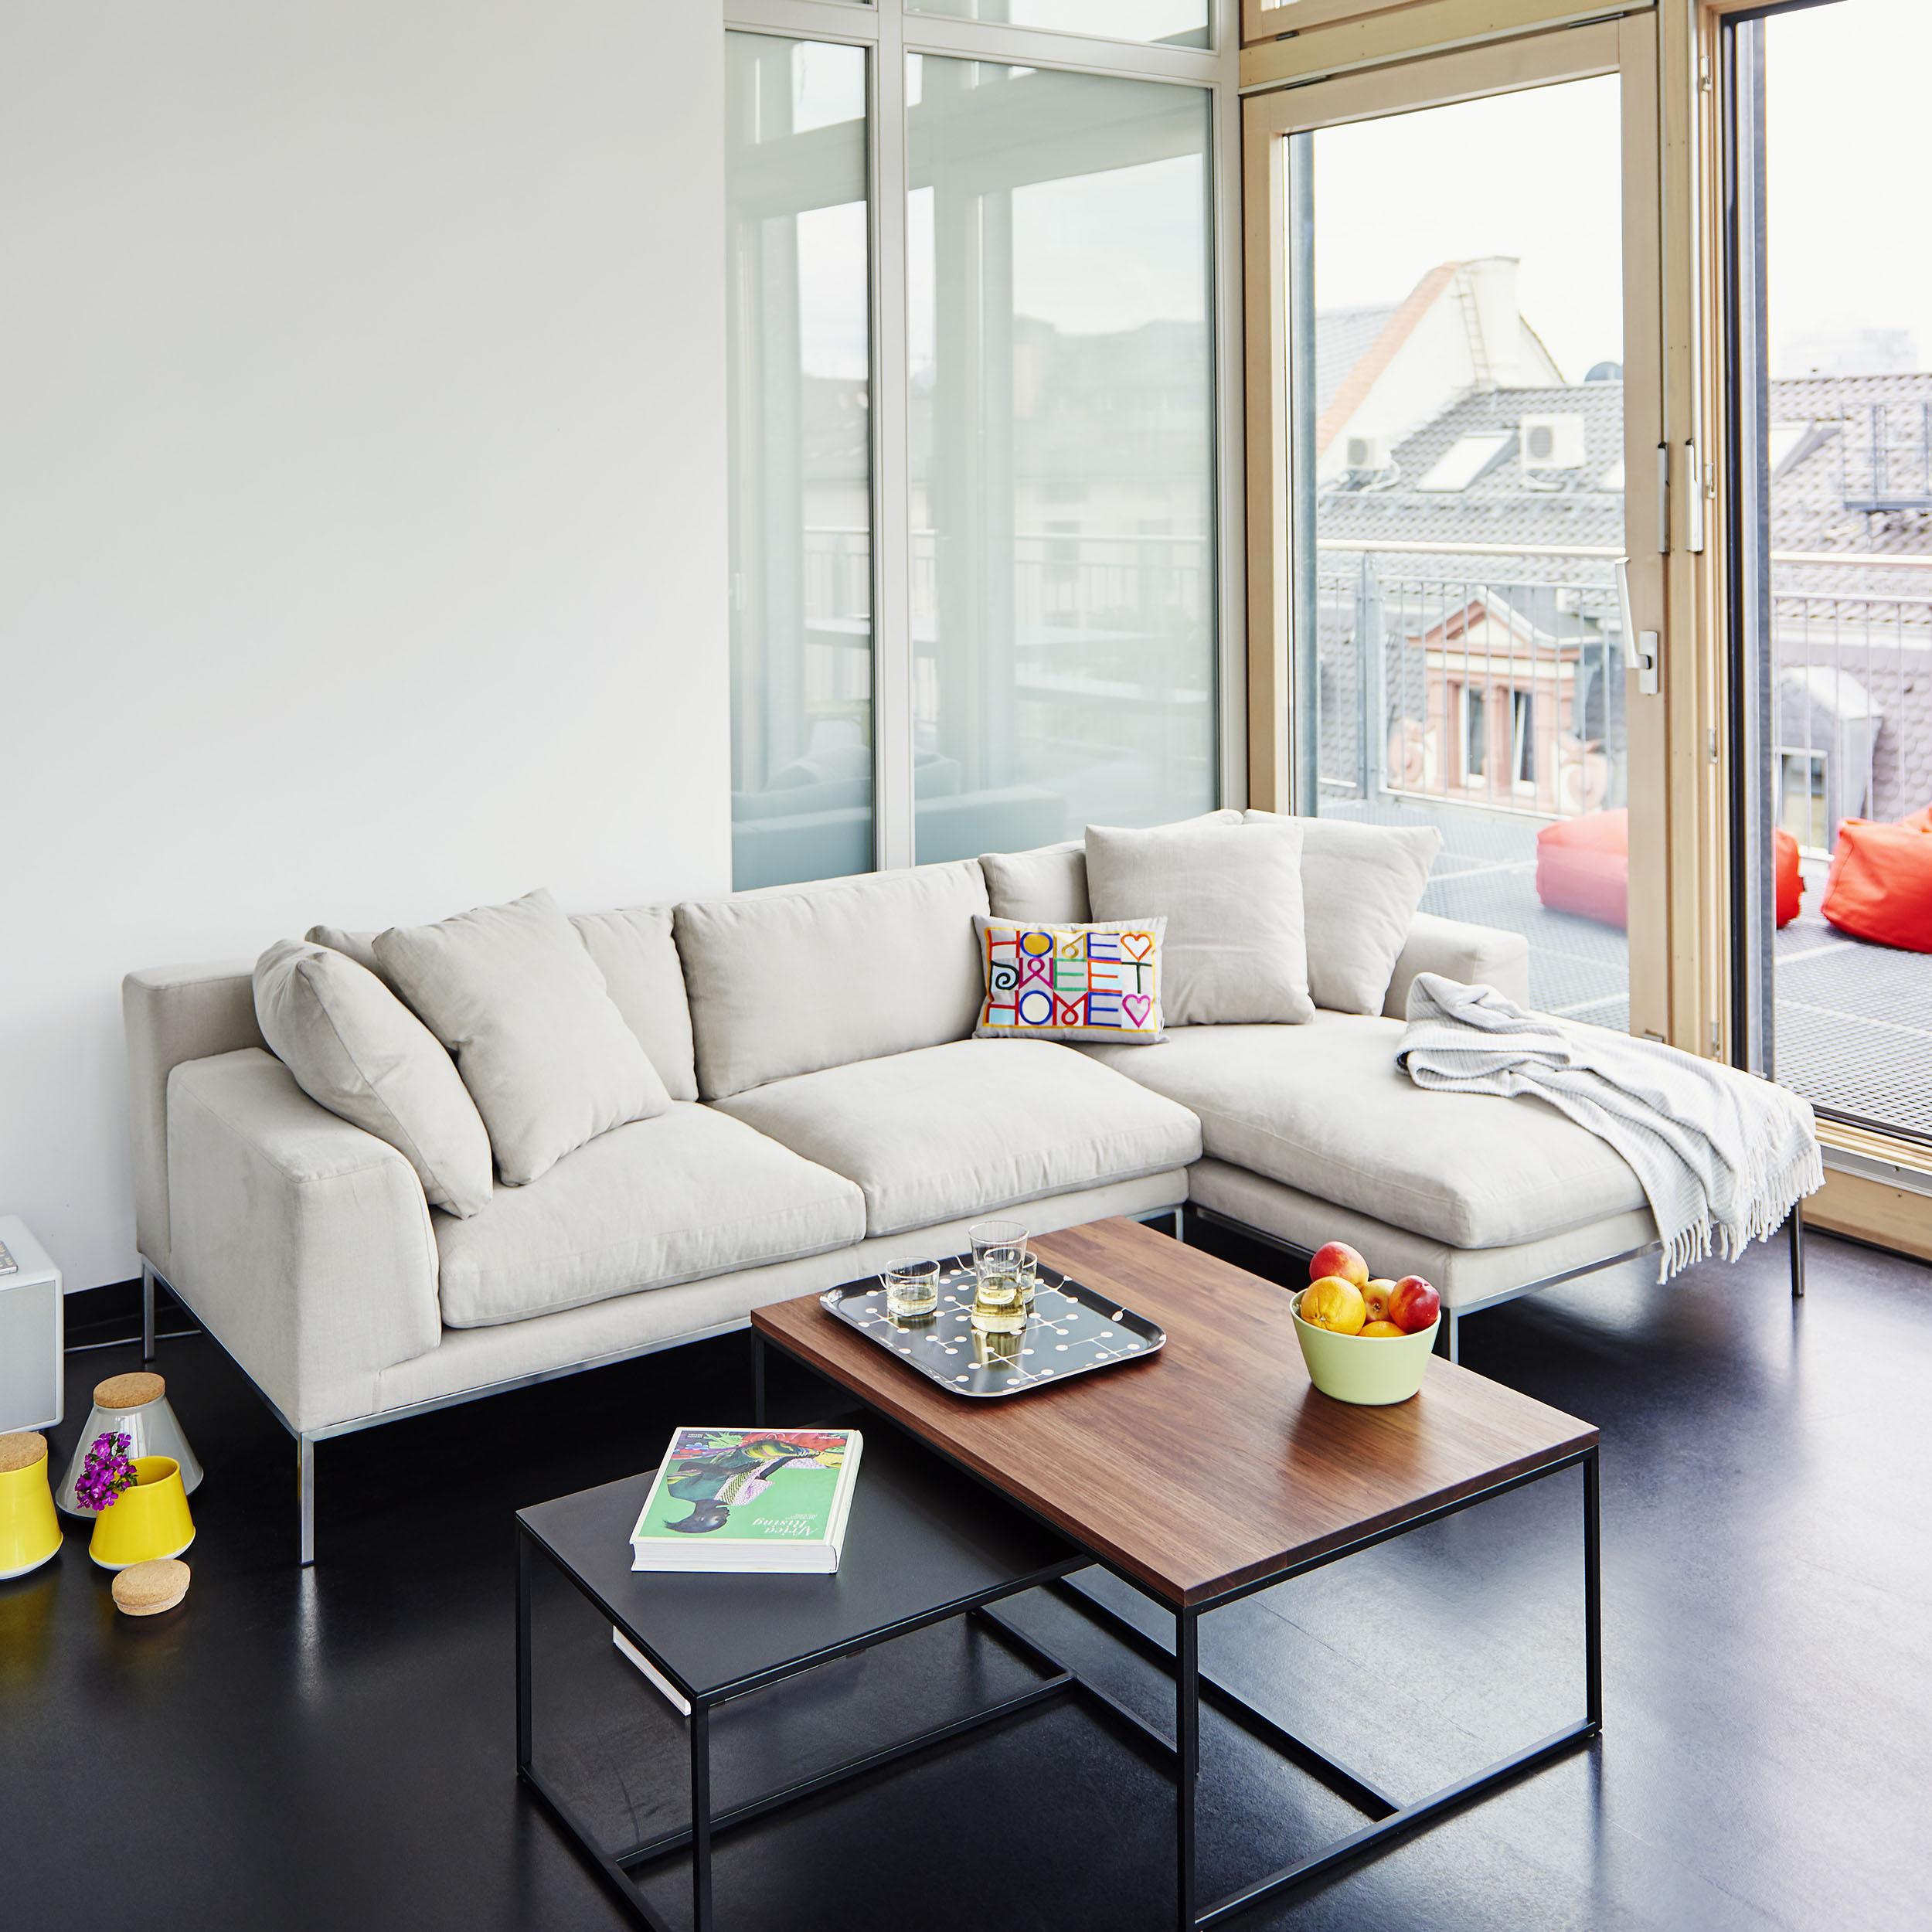 Modello 2,5-Sitzer Sofa mit Longchair rechts